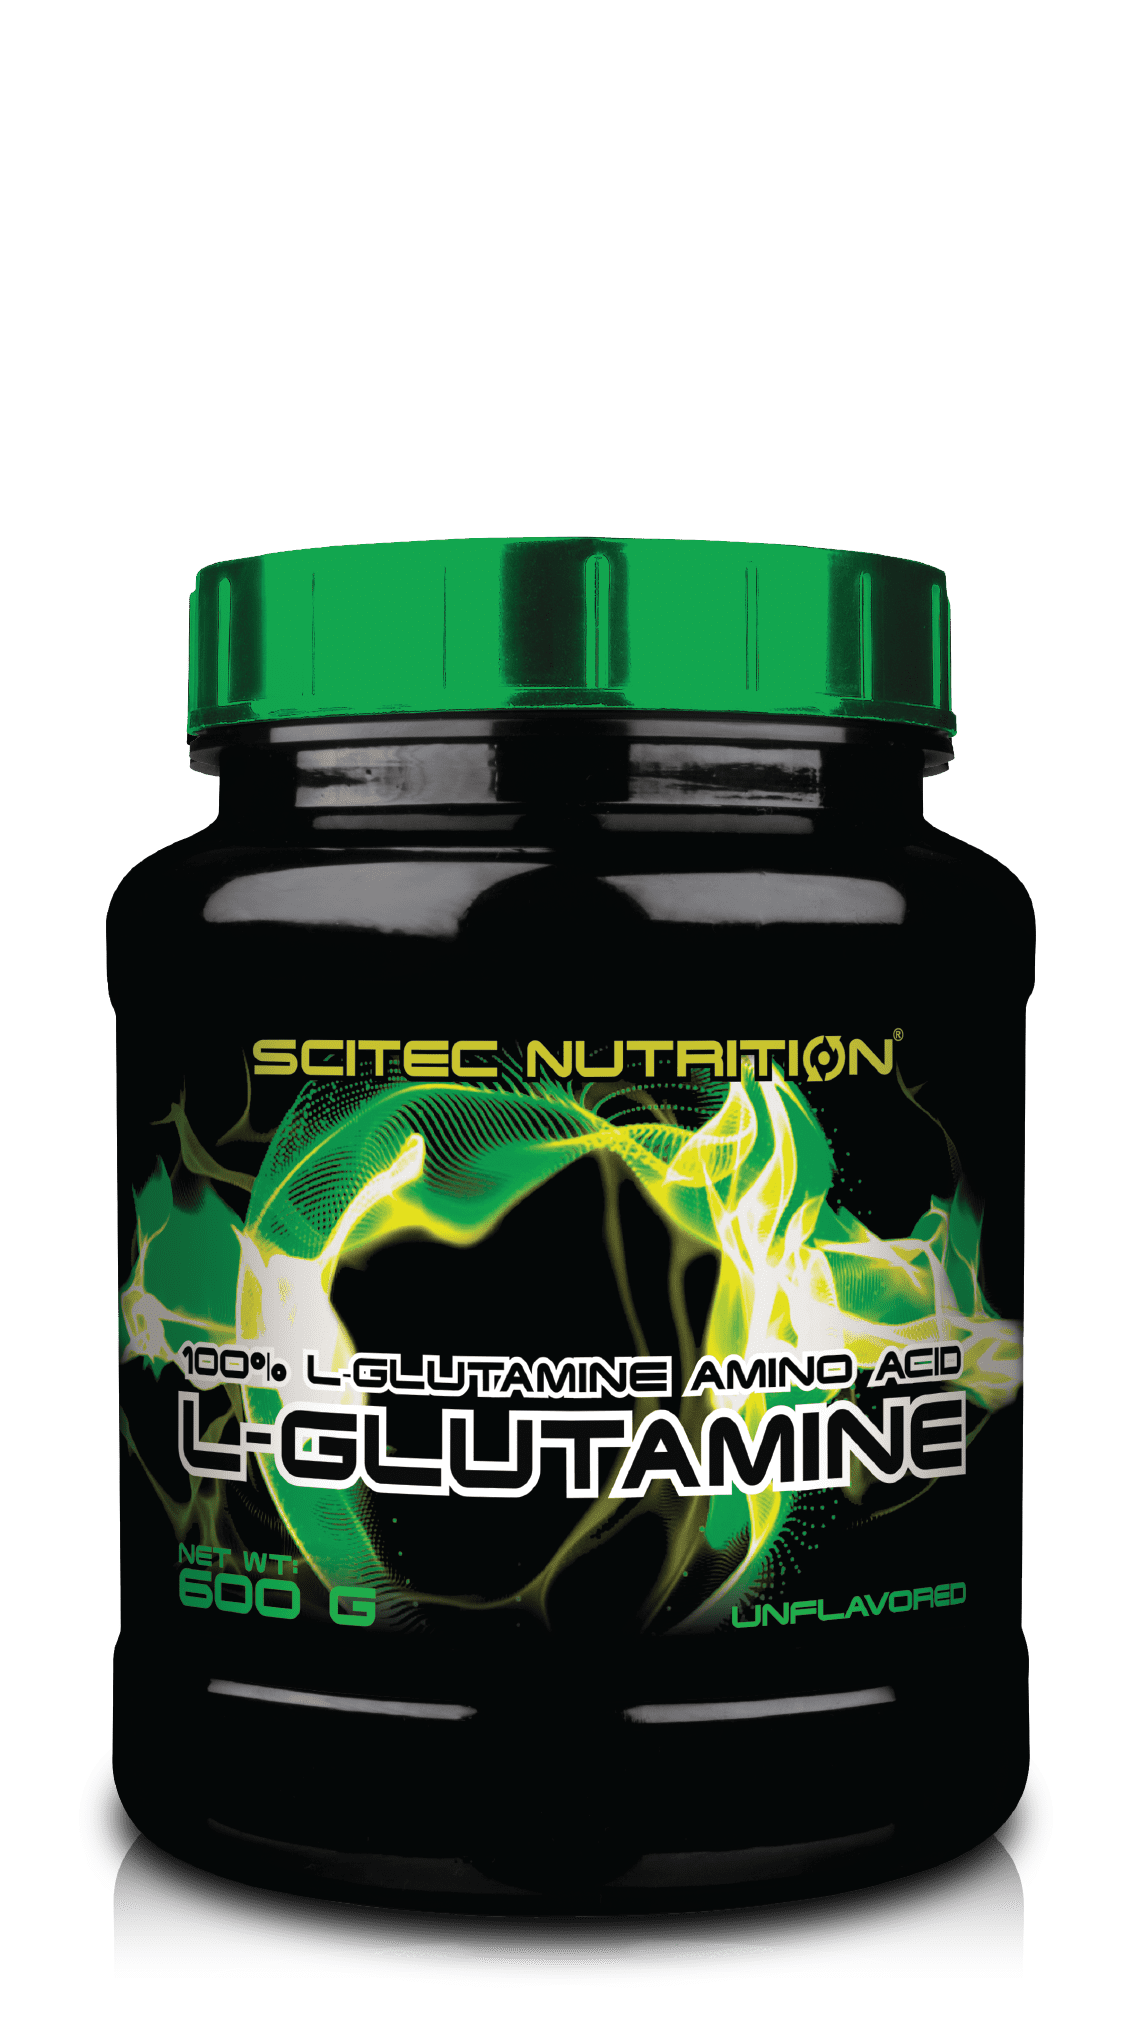 L-Glutamine (Amino Acid)